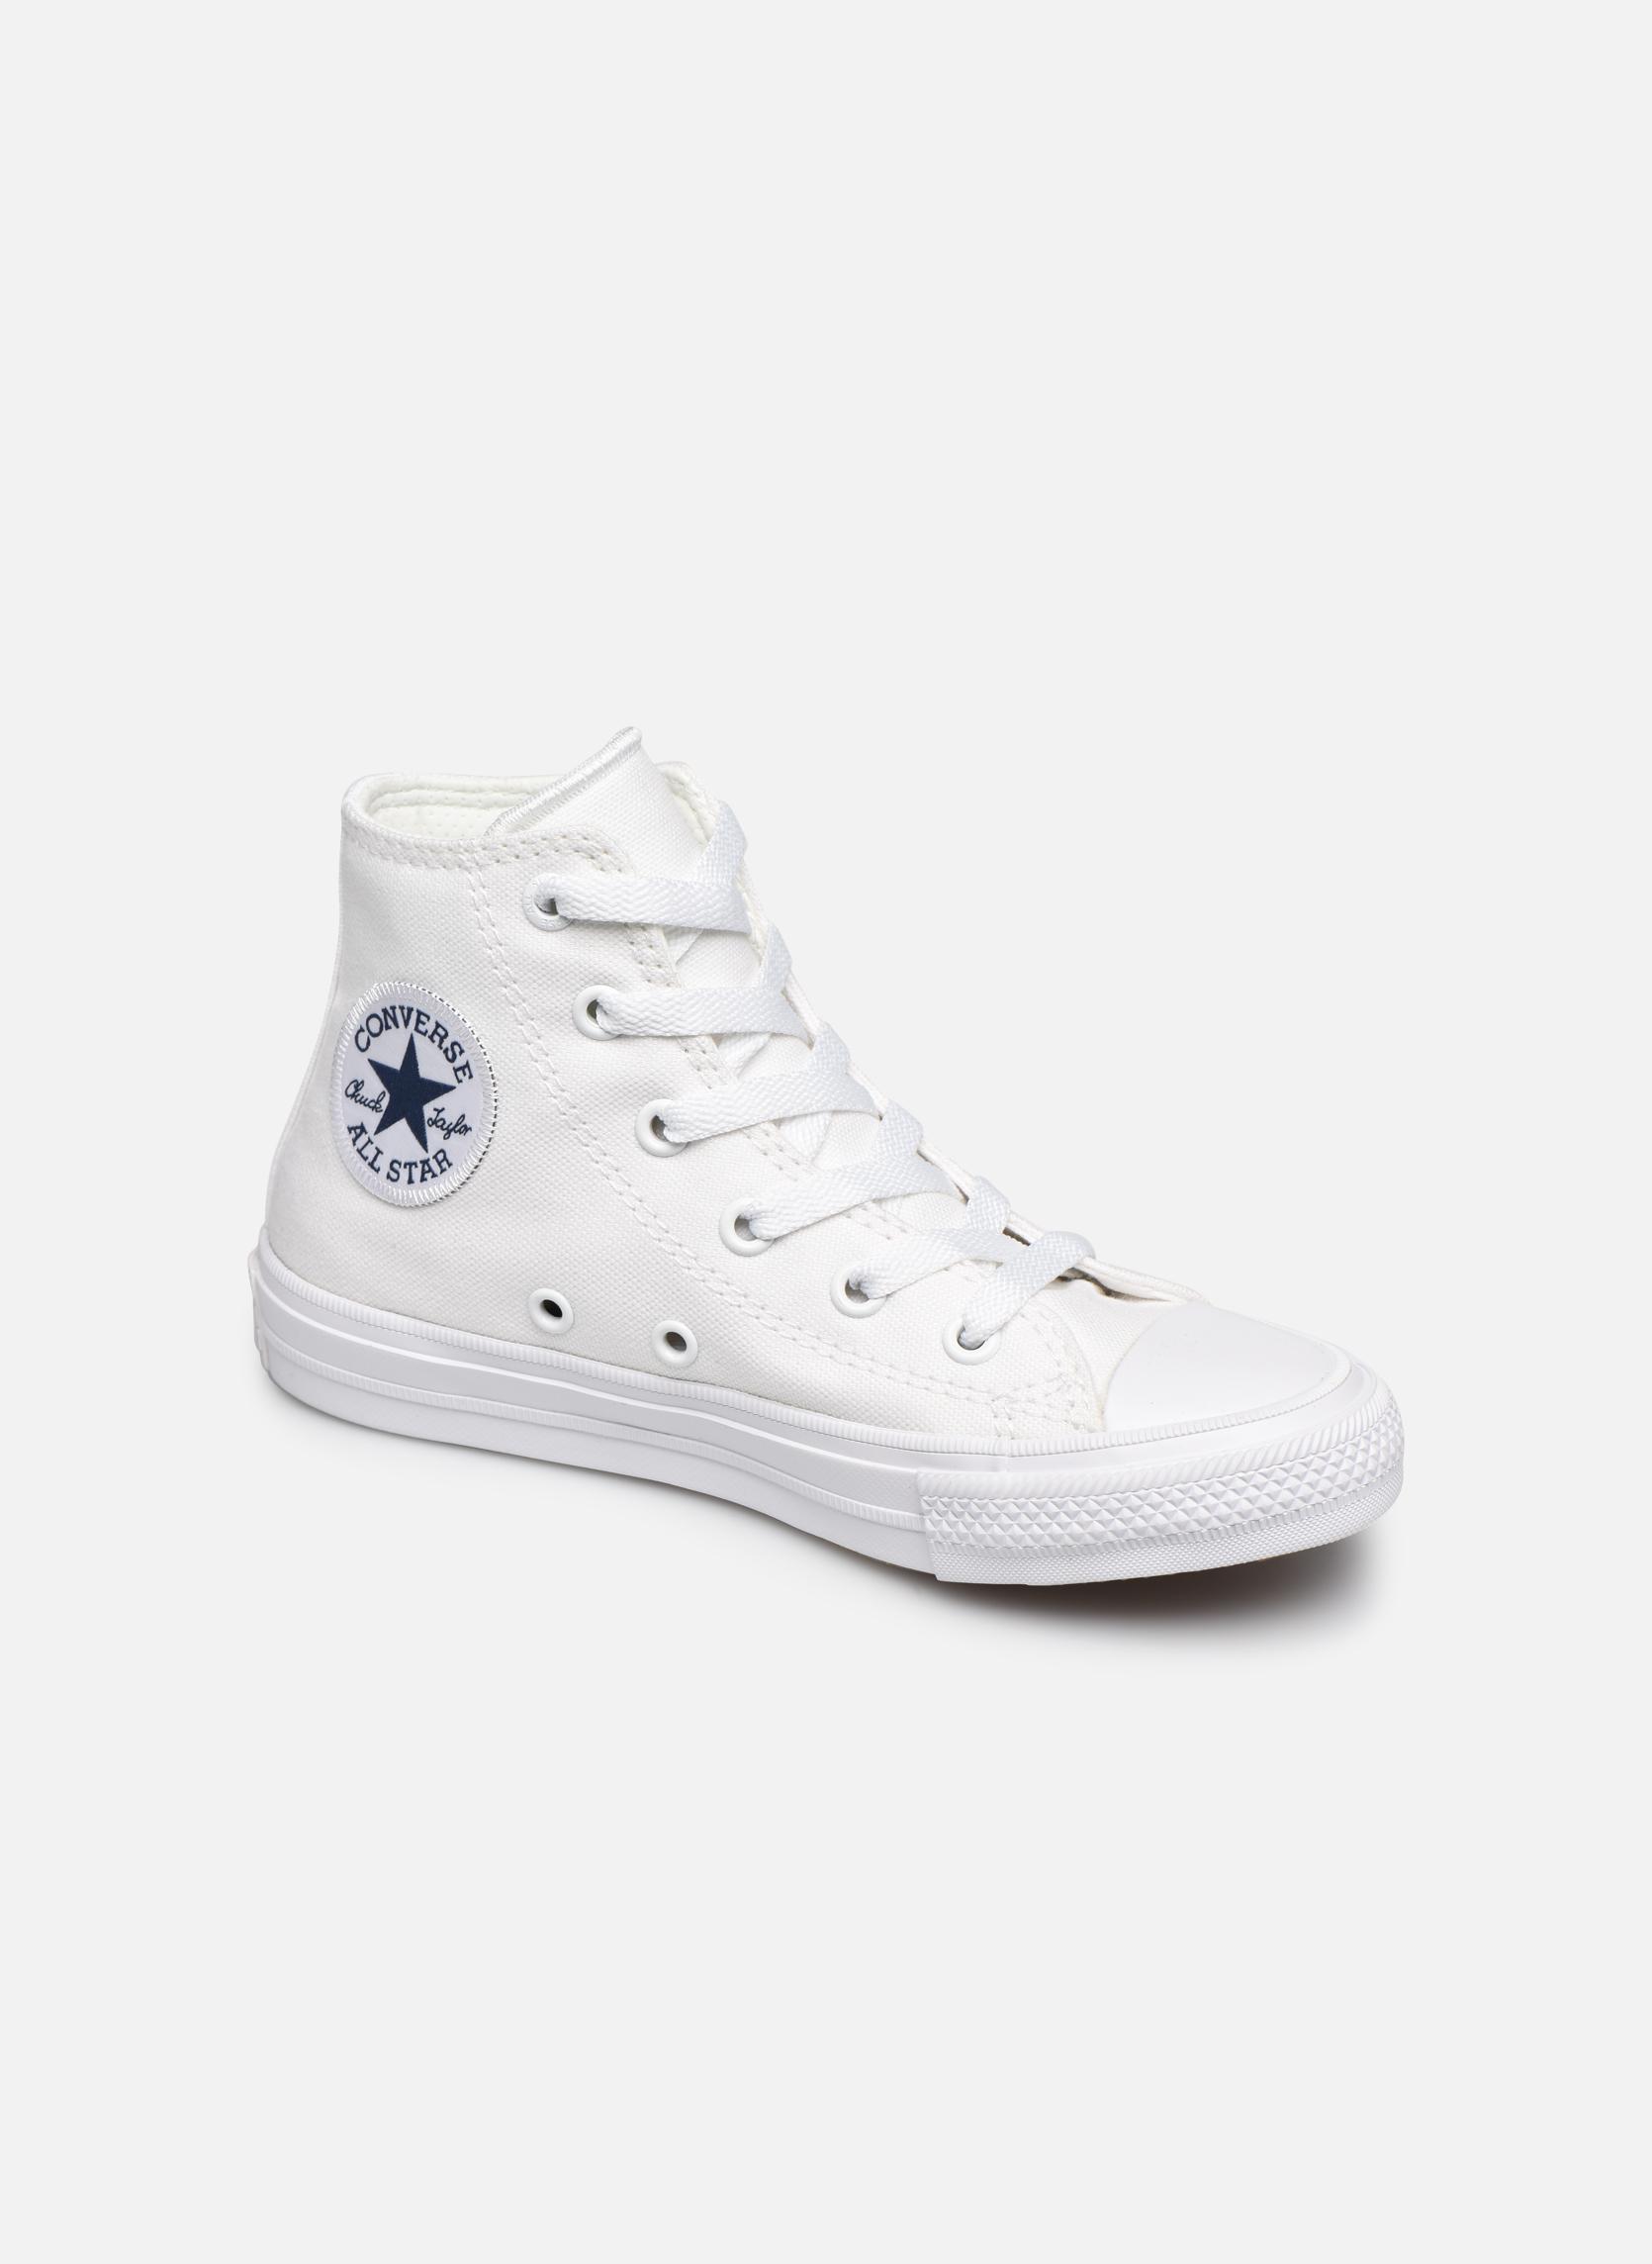 Chuck Taylor All Star II Hi White White Navy